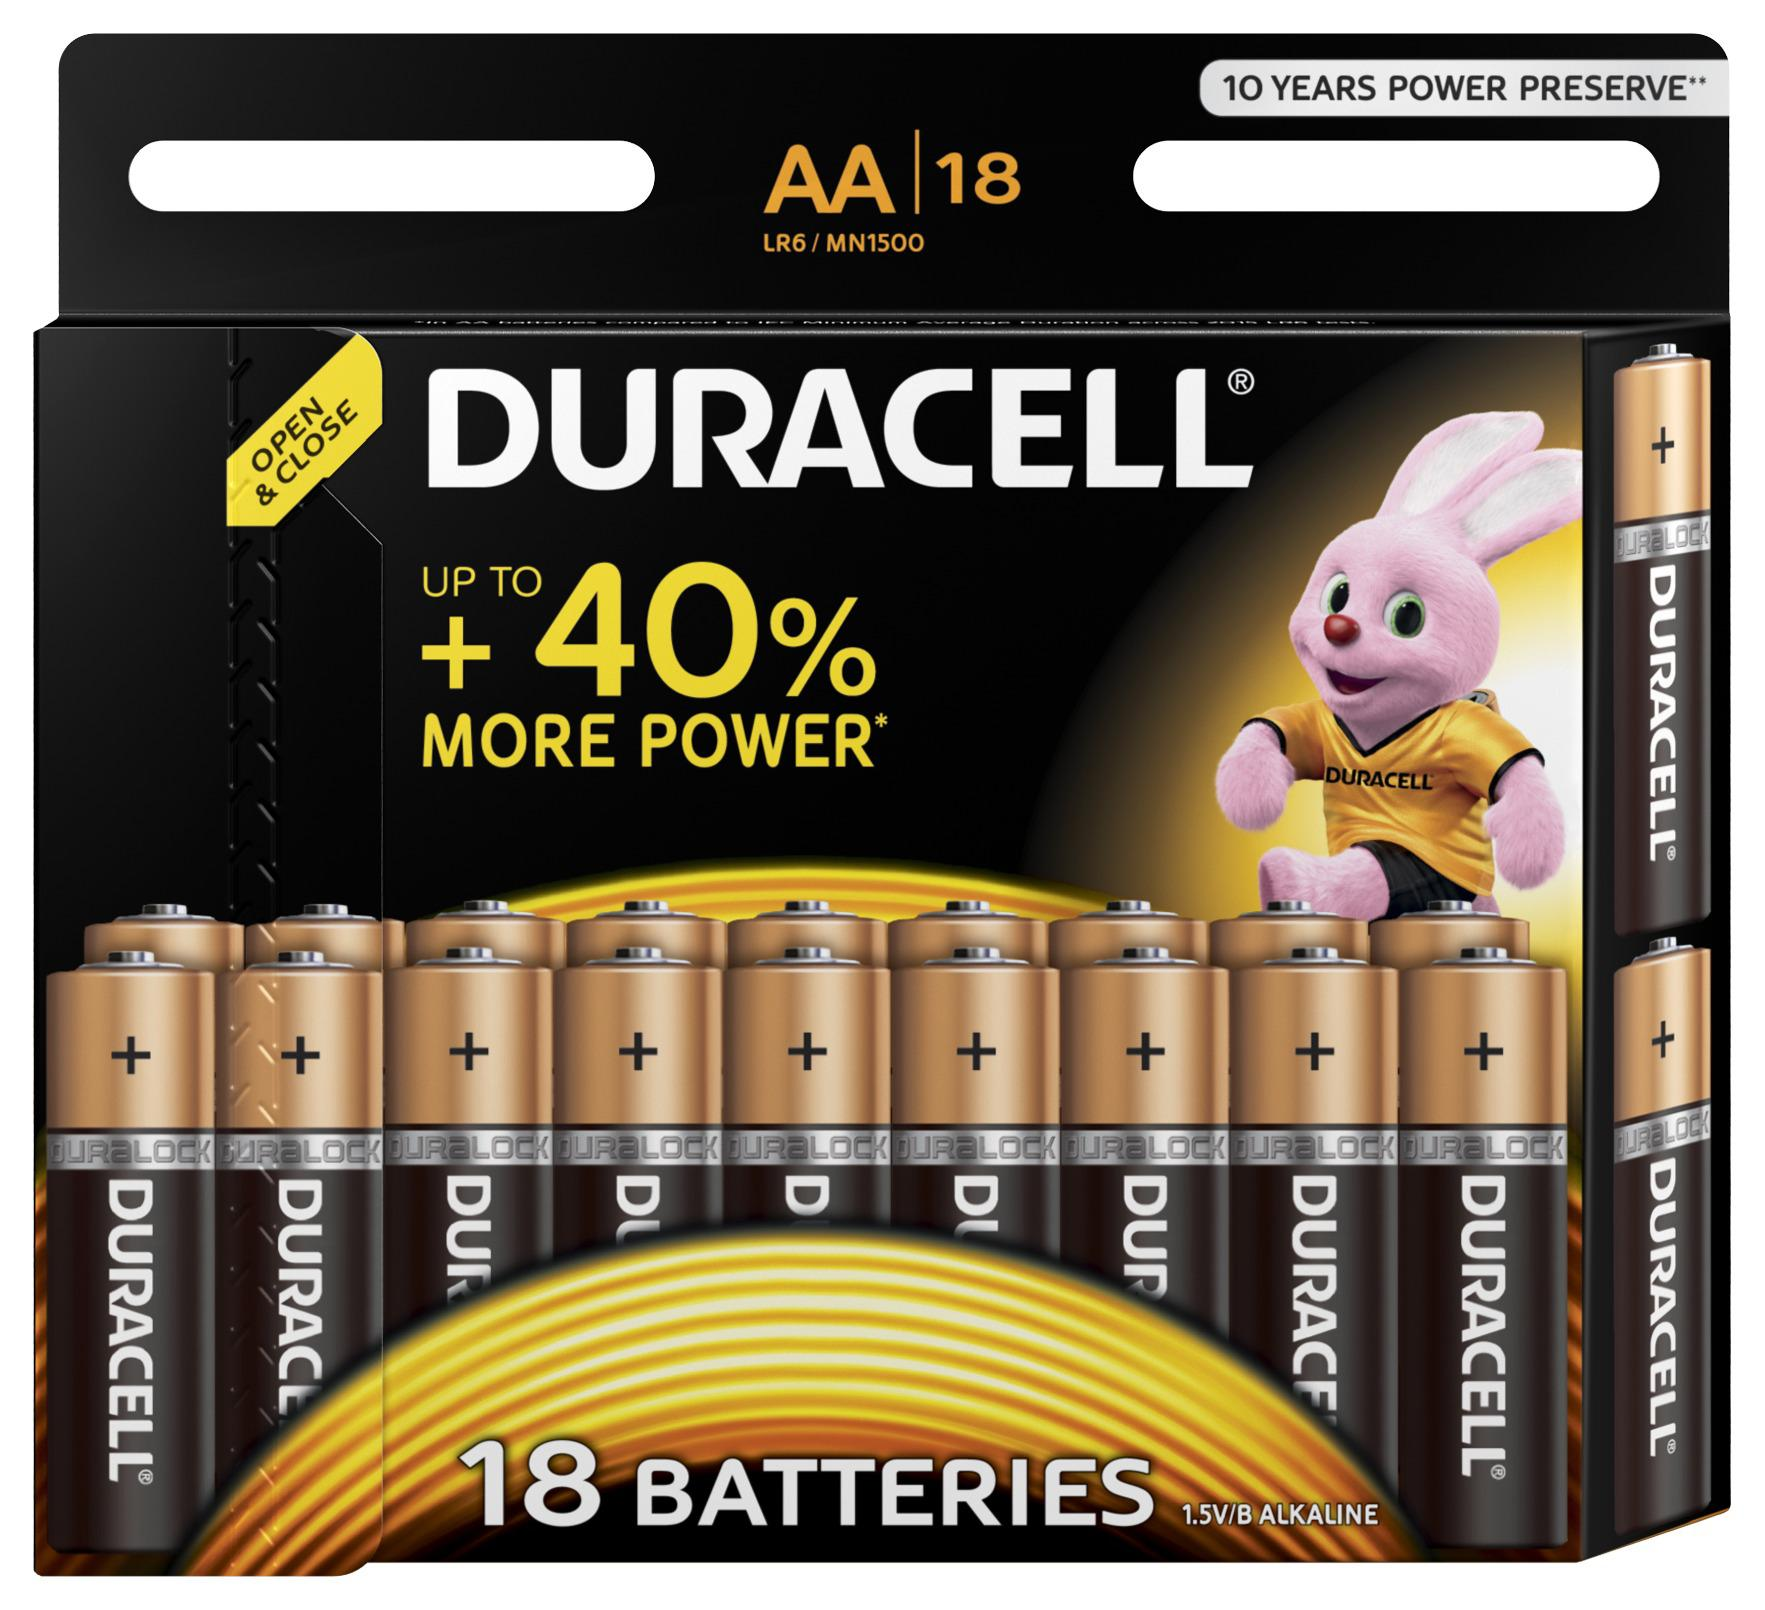 Фото - Батарейка Duracell Lr6-18bl basic Б0014448 Тип: aa (lr6) (Кол-во в уп. 18шт.) аккумулятор fenix arb l18 2900 тип aa lr6 кол во в уп 1шт